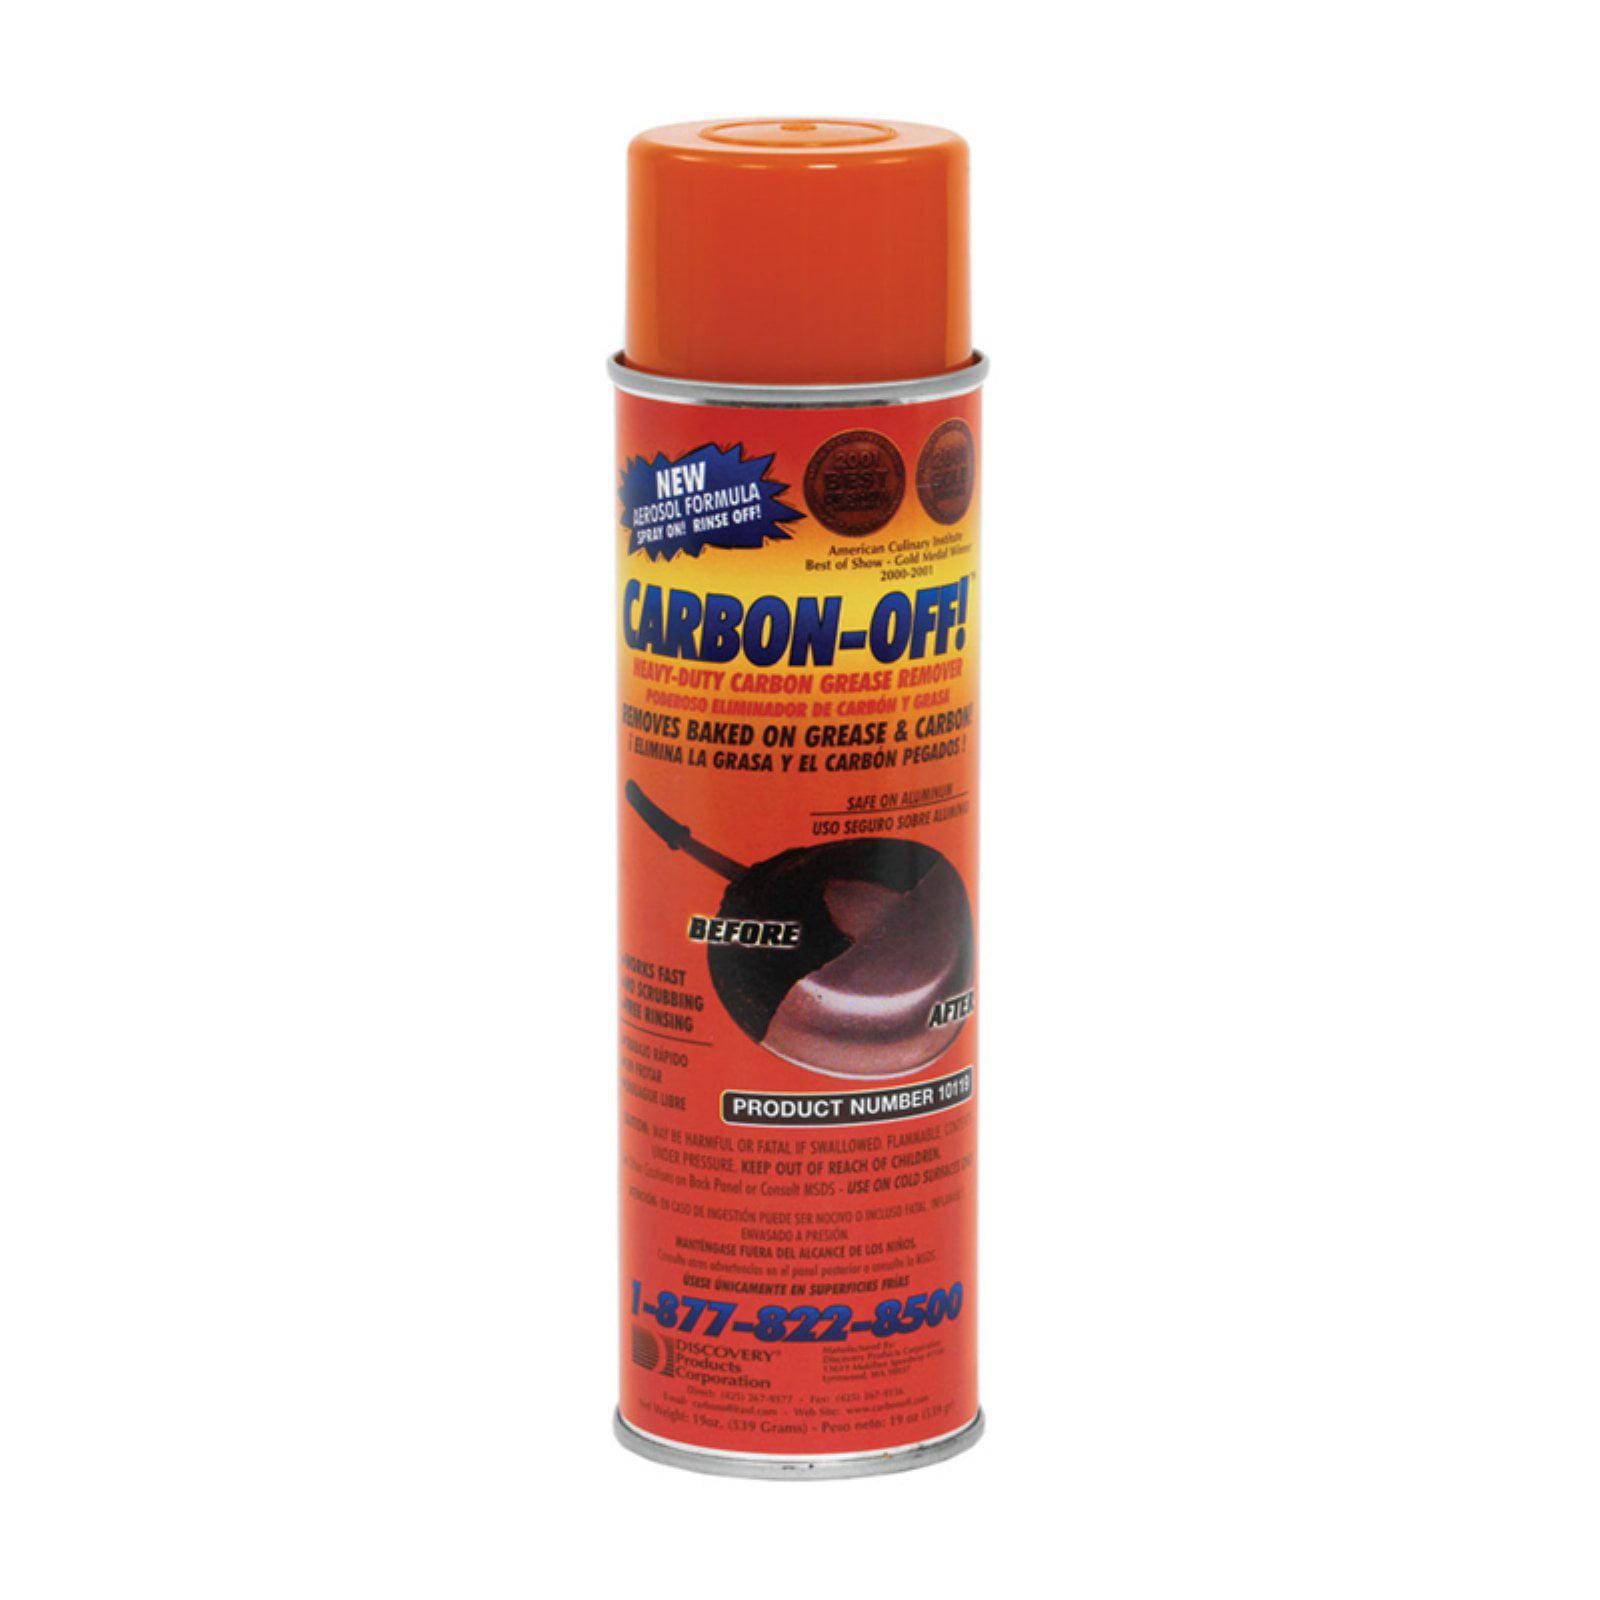 Paragon Carbon Off 19 oz. Aerosol Can